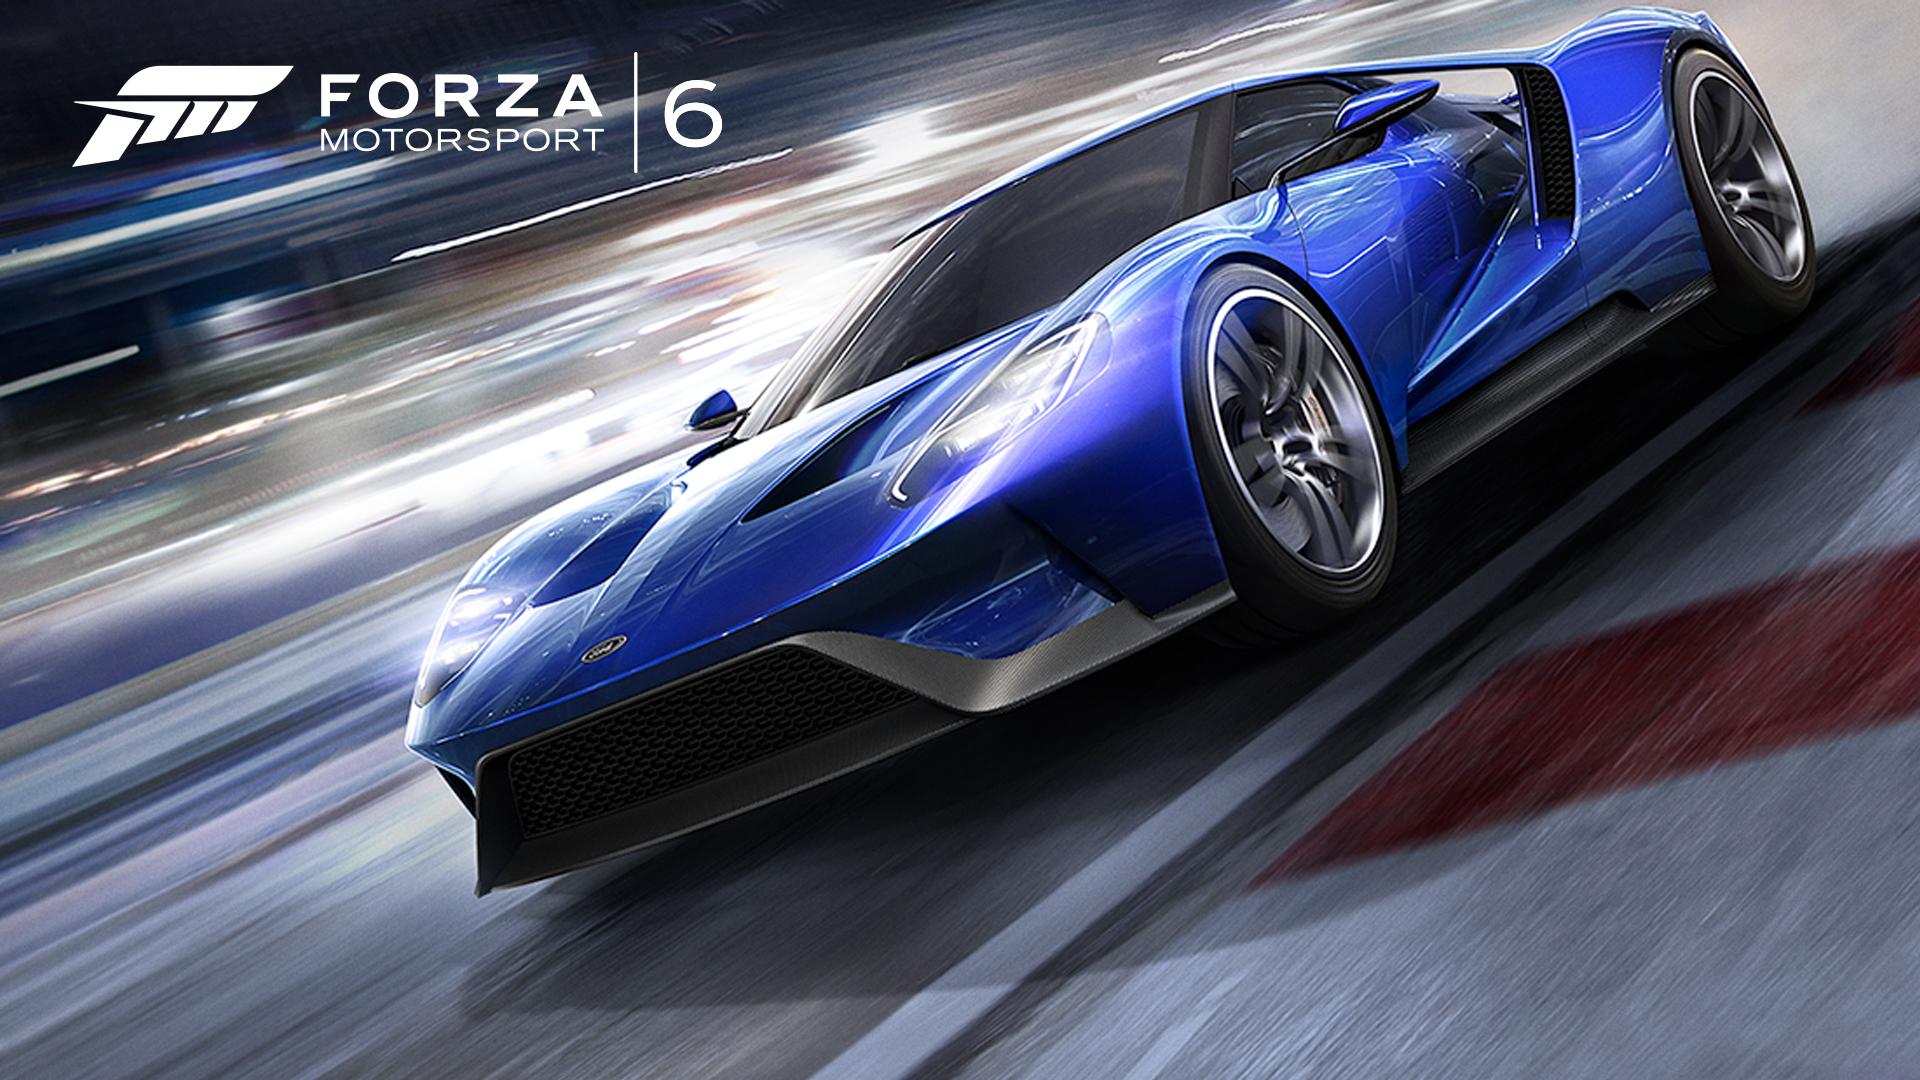 Арт к игре Forza Motorsport 6